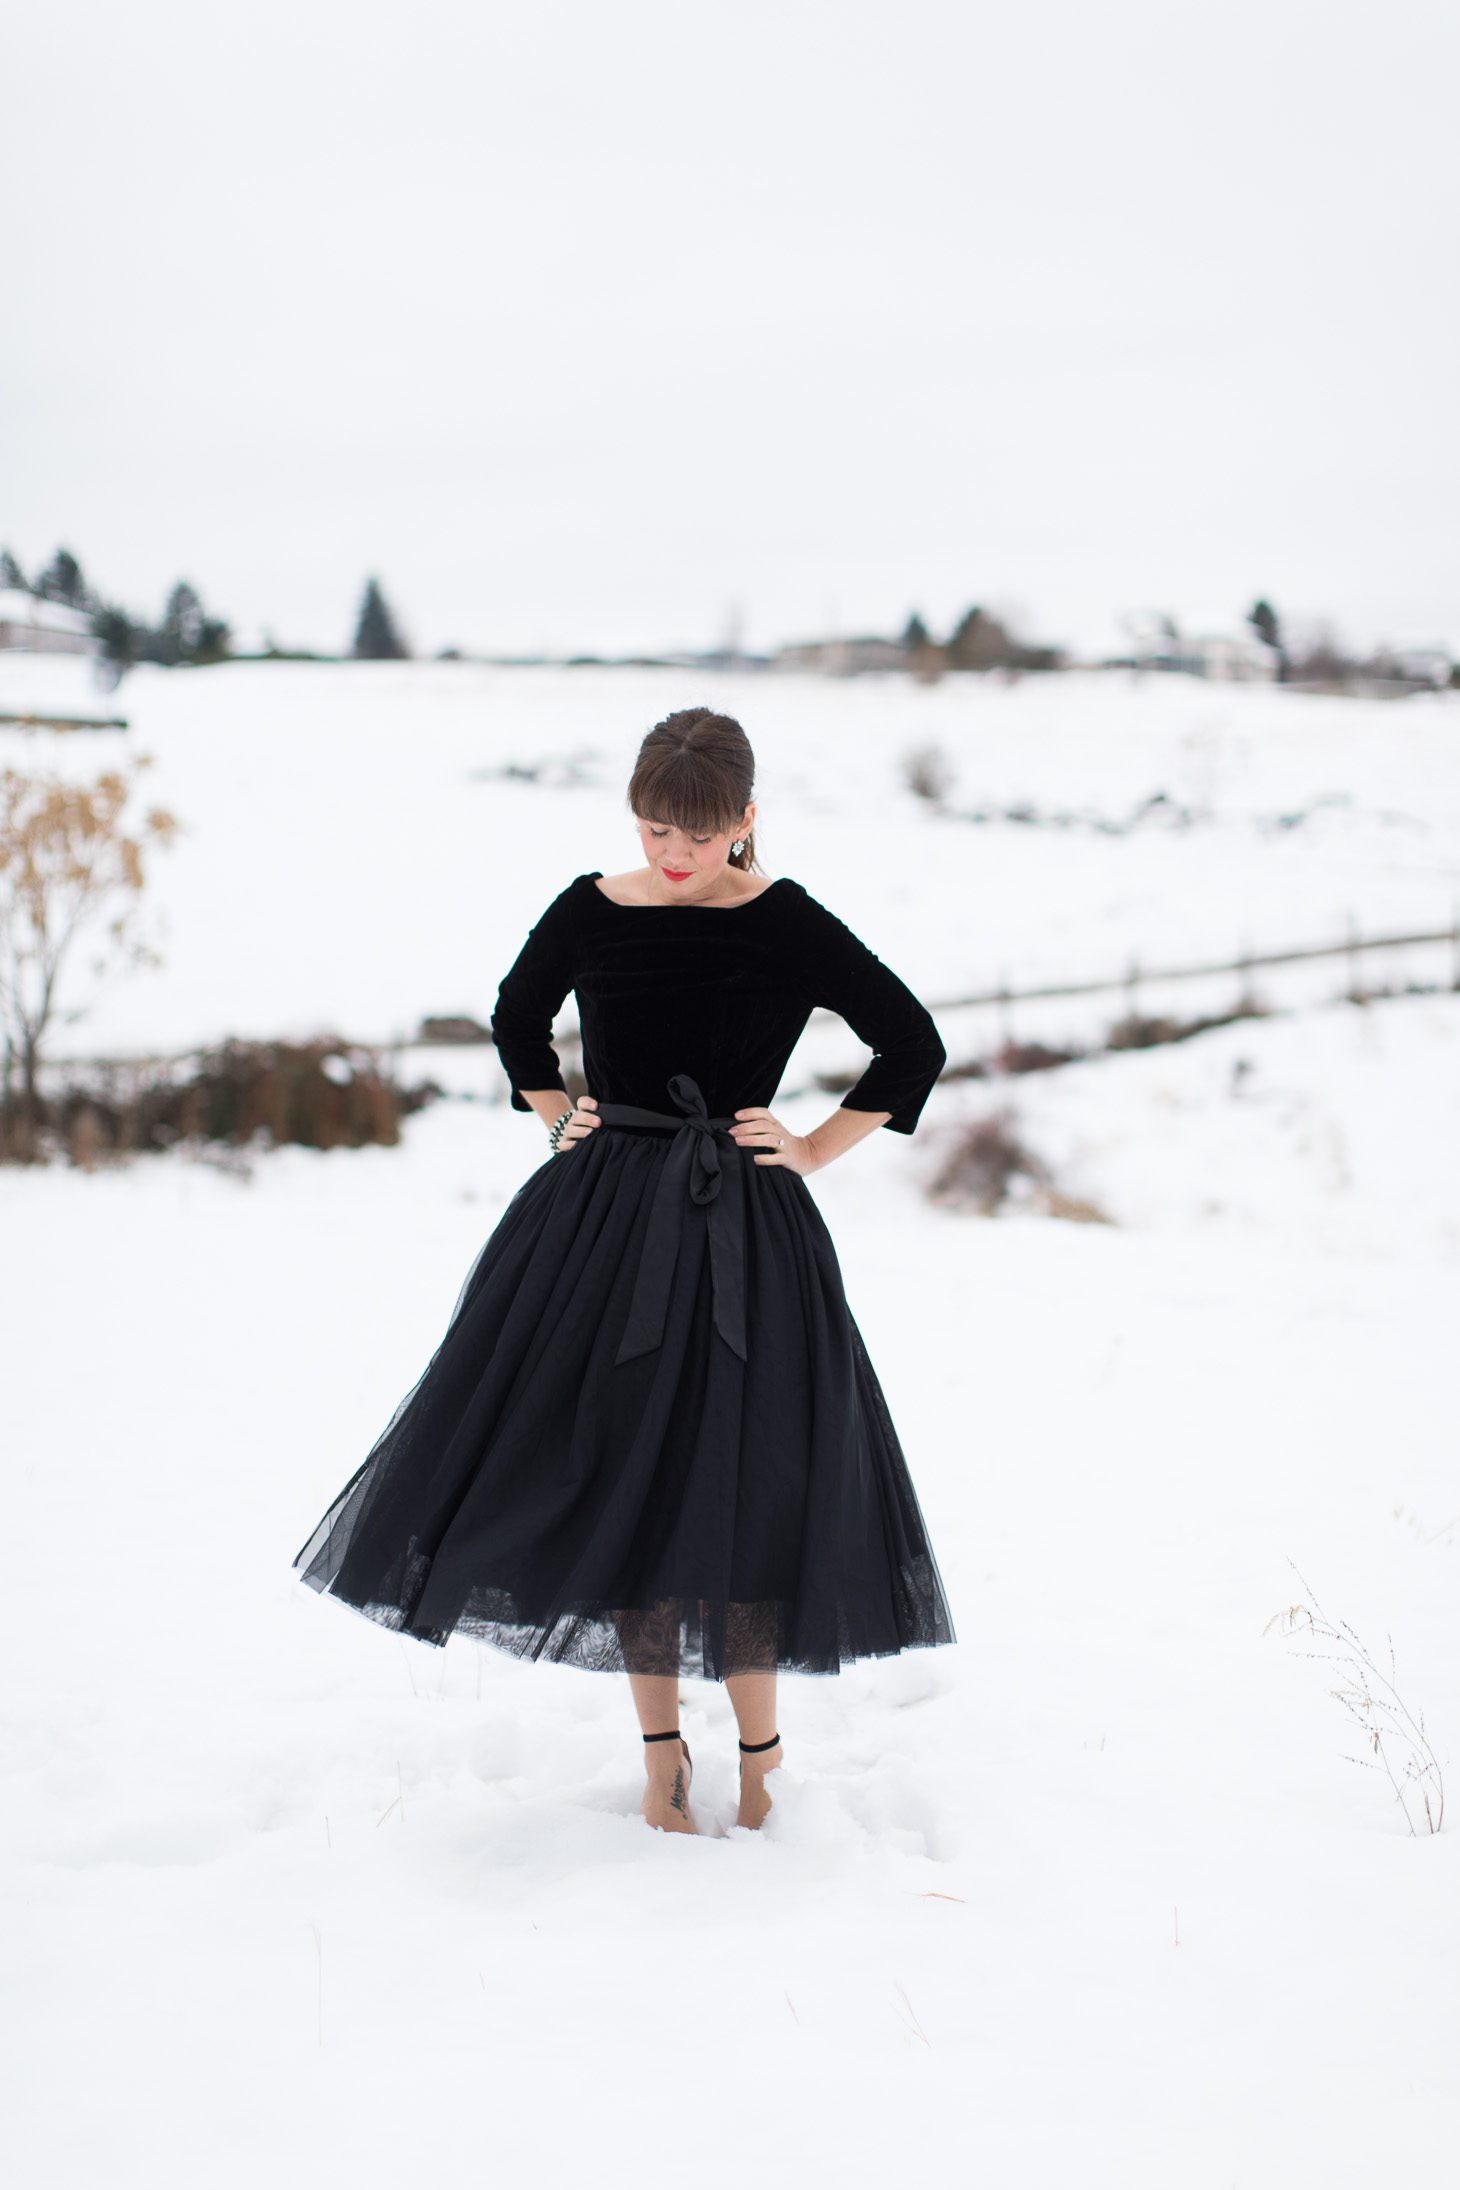 Jillian Harris ModCloth Holiday Dresses